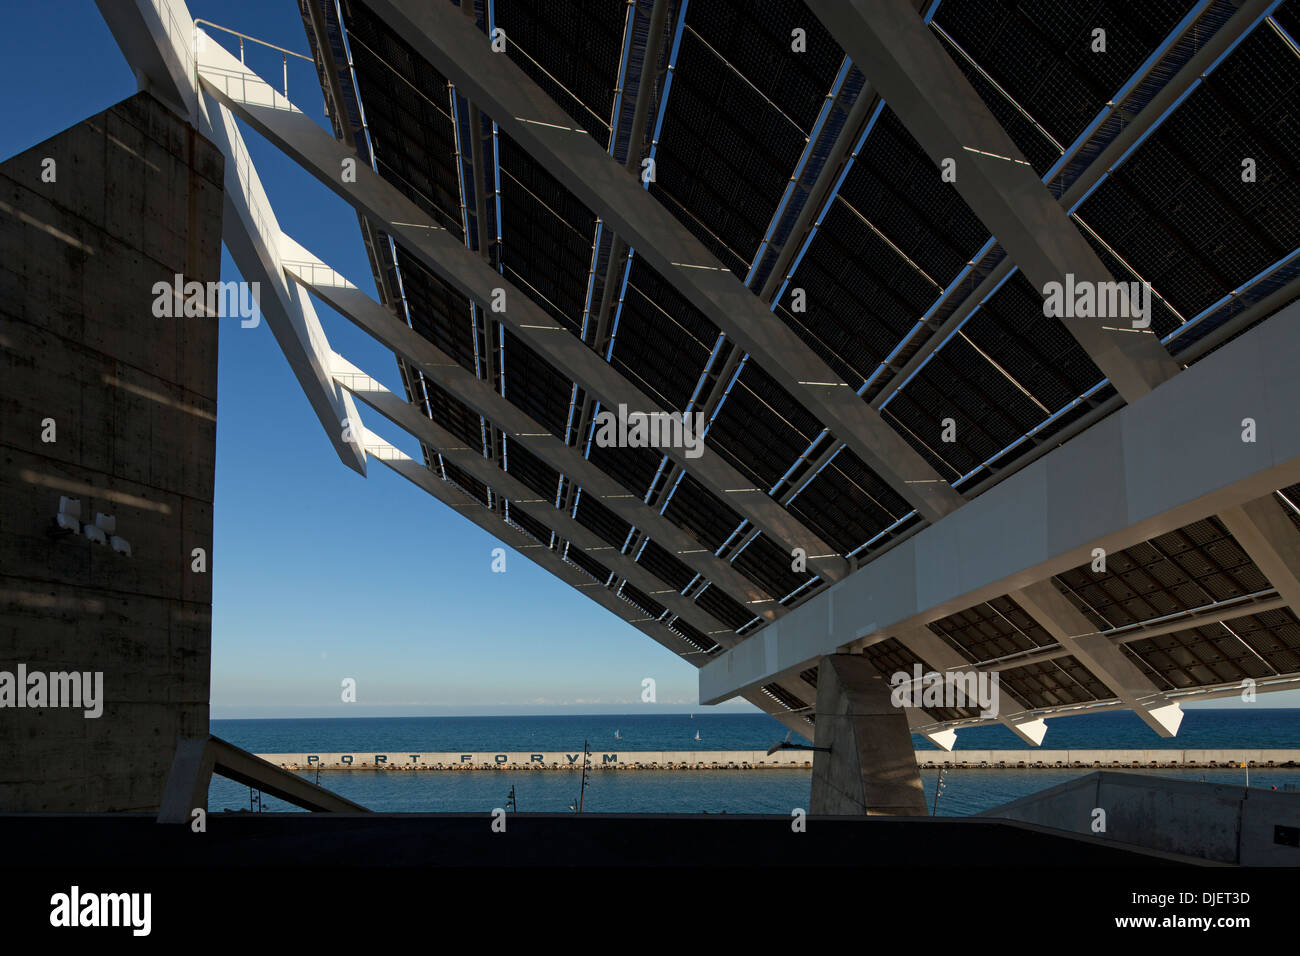 Solar panel parc del forum barcelona stock photo royalty free image 63021153 alamy - Solar barcelona ...